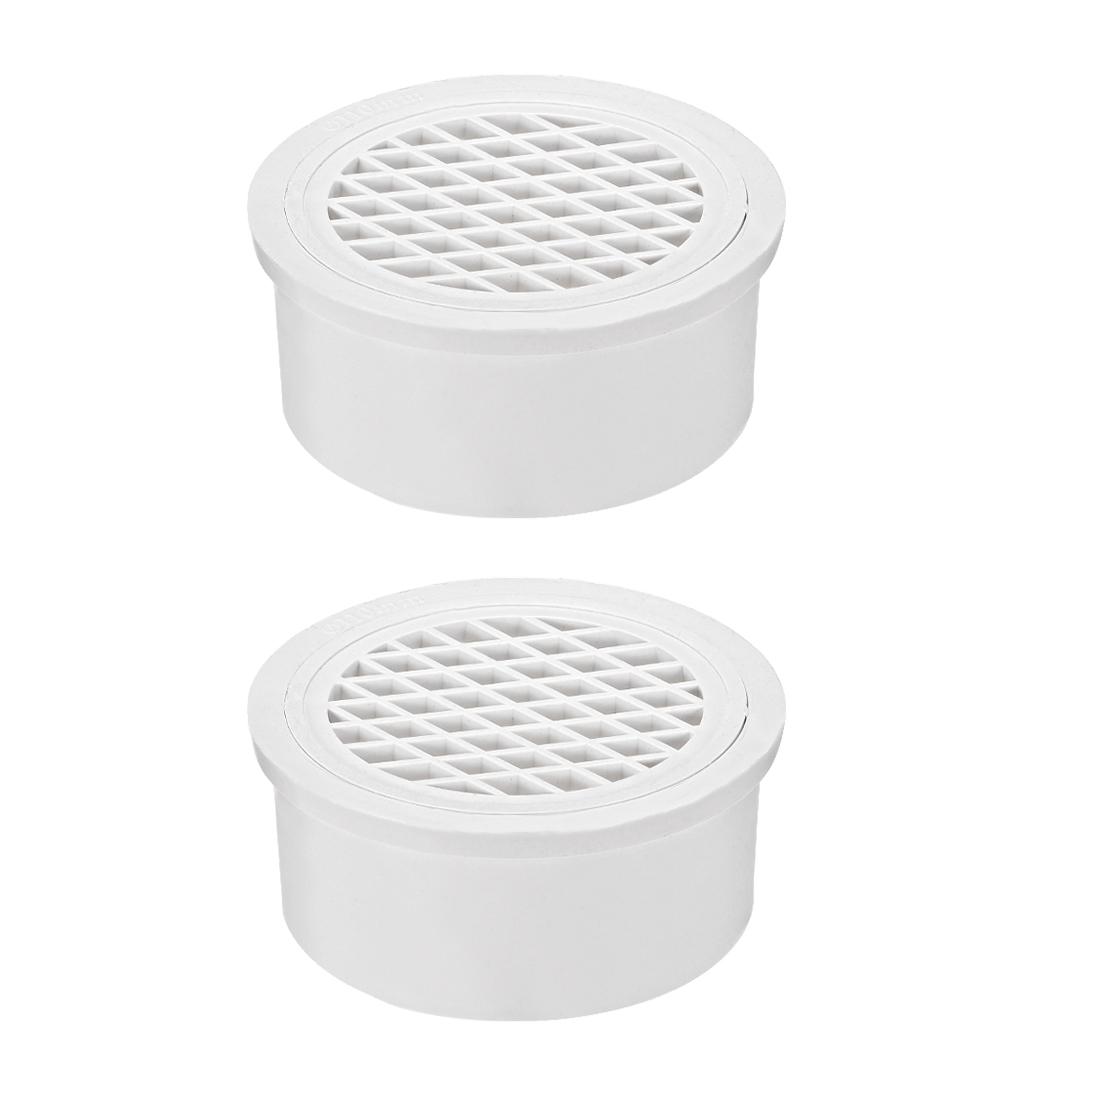 PVC Snap-In Floor Drain 4-inch Bathroom Sink And Tub Drain Strainers 2pcs